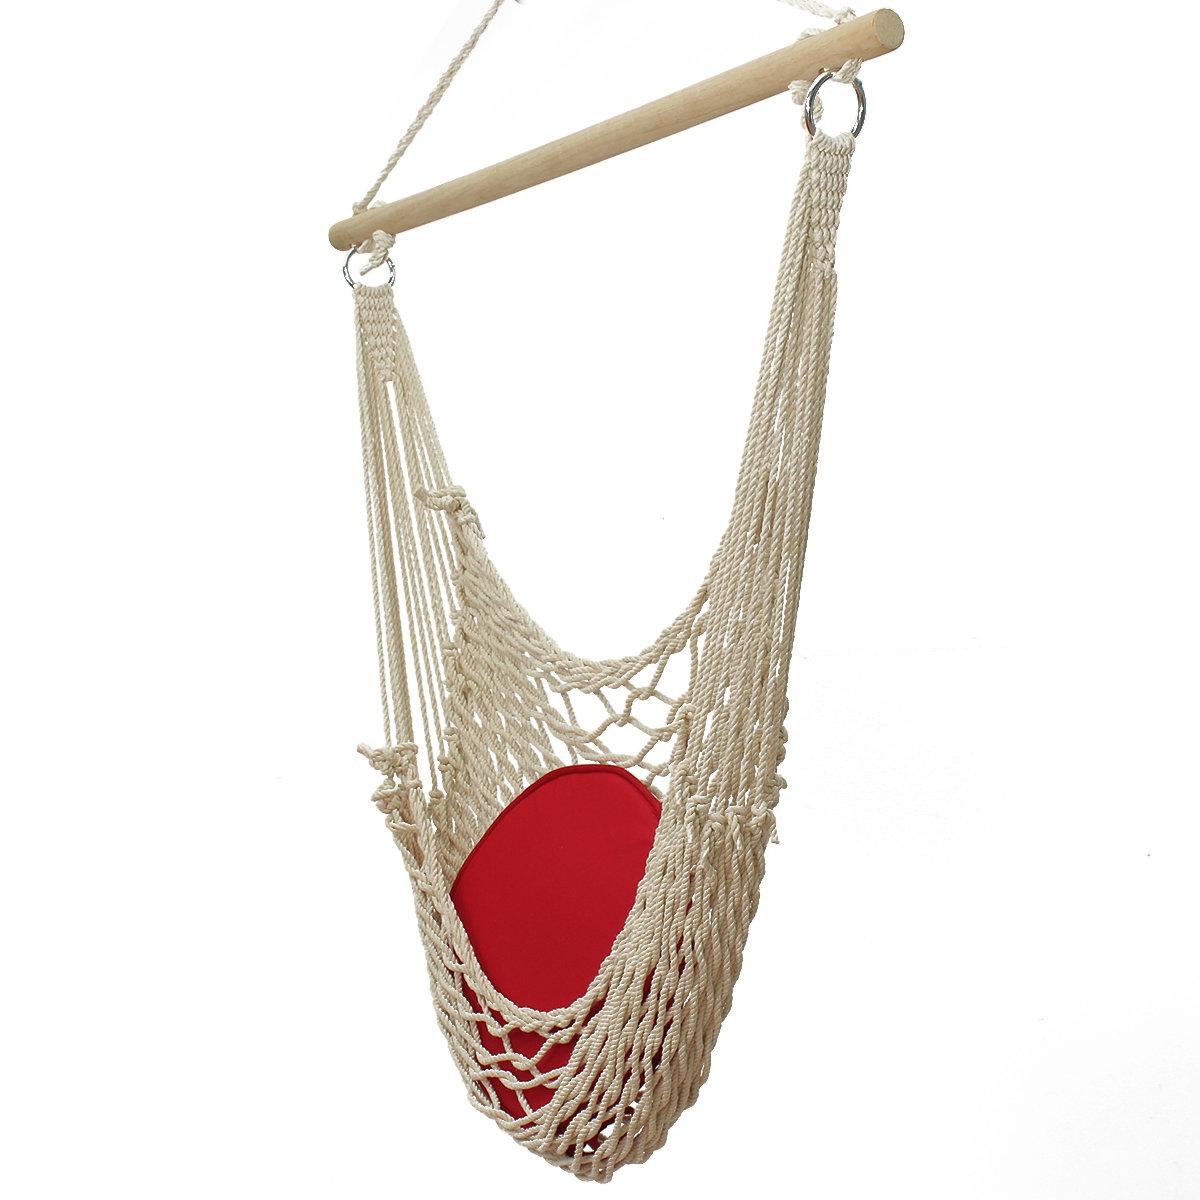 Hanging Swing Garden Patio Hammock Chair Cotton Rope Wooden Bar White Hammock Chair